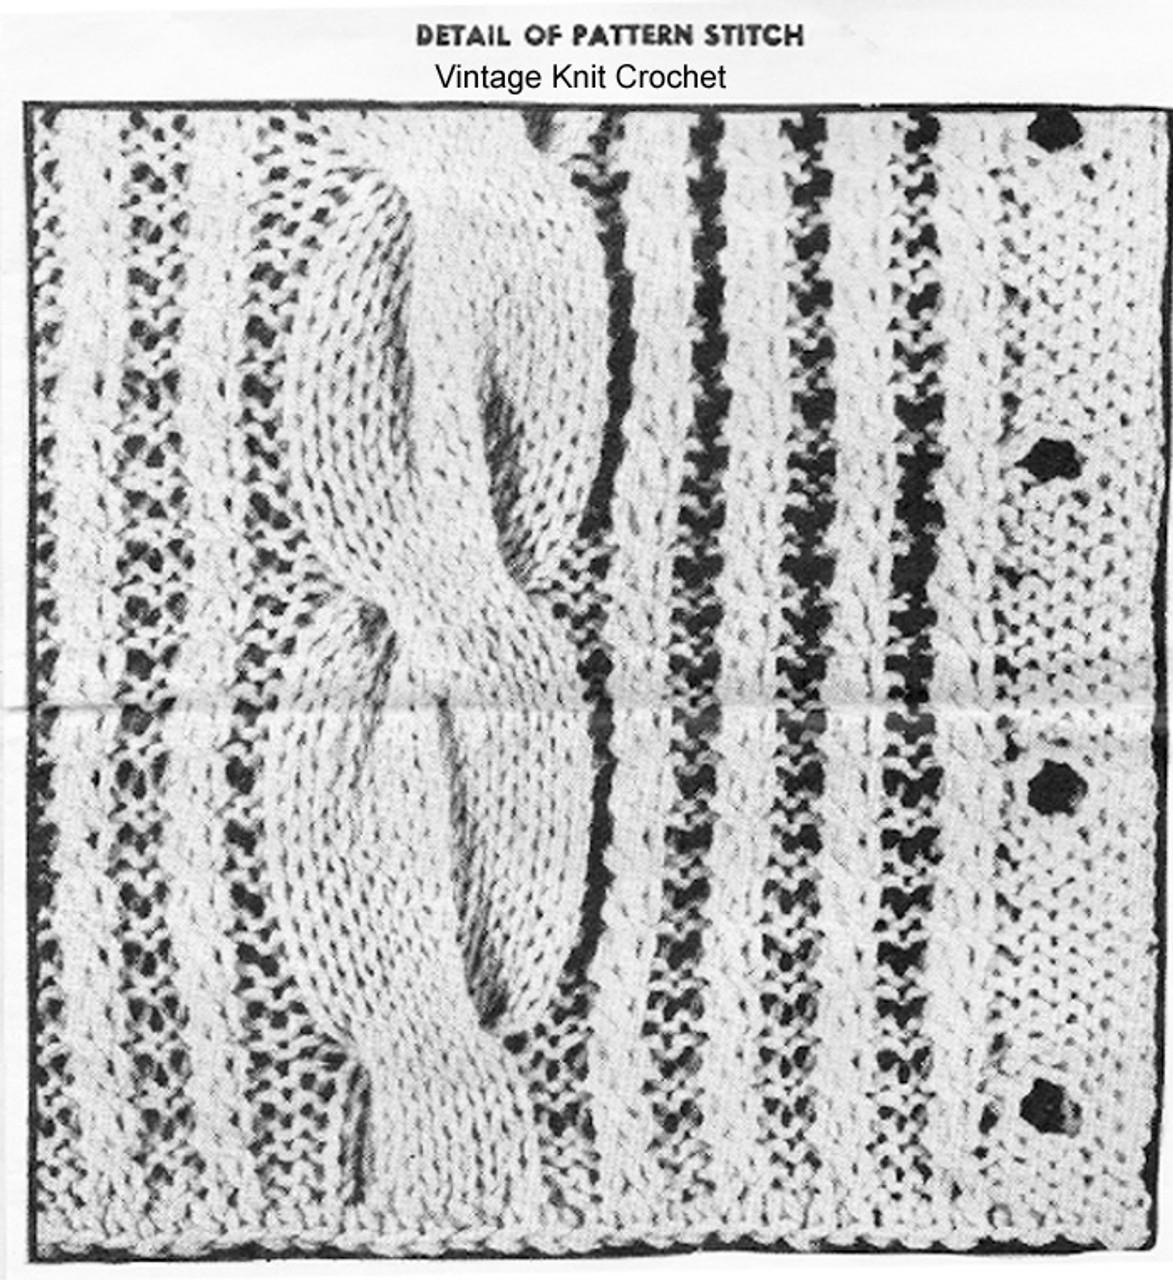 Cable jacket pattern stitch illustration for Design 825